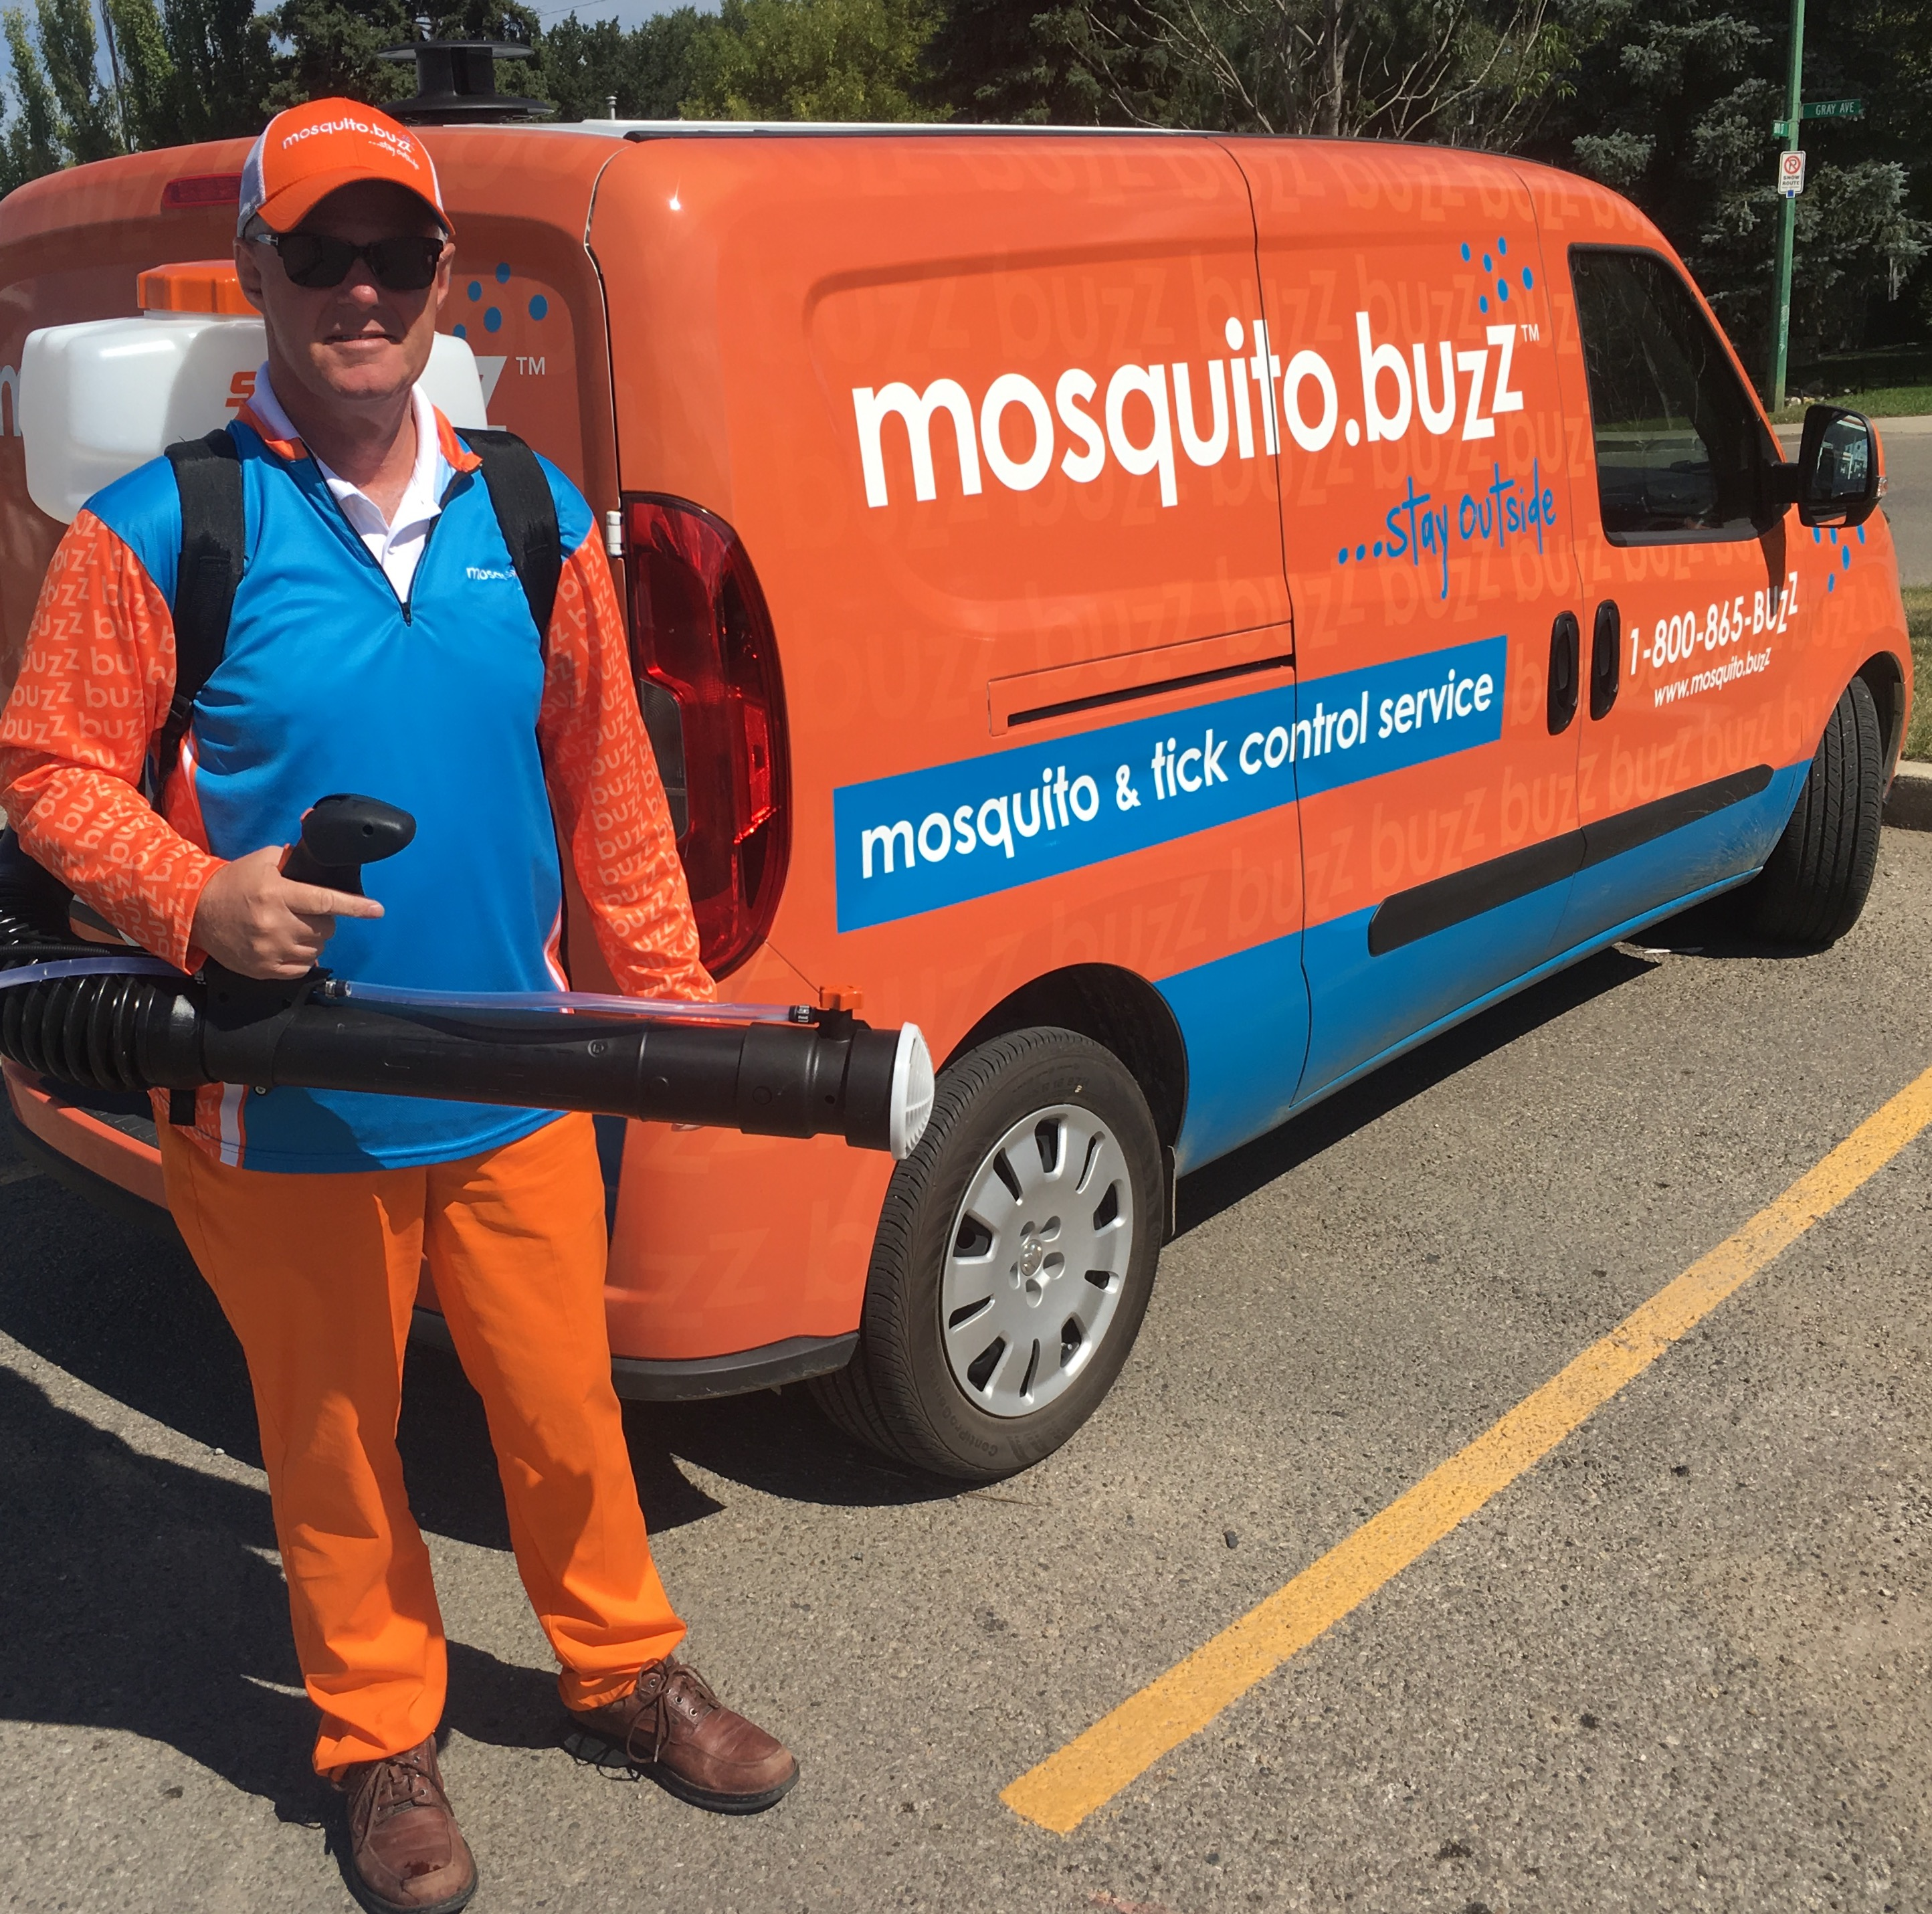 Doug George - Mosquito.Buzz Saskatoon